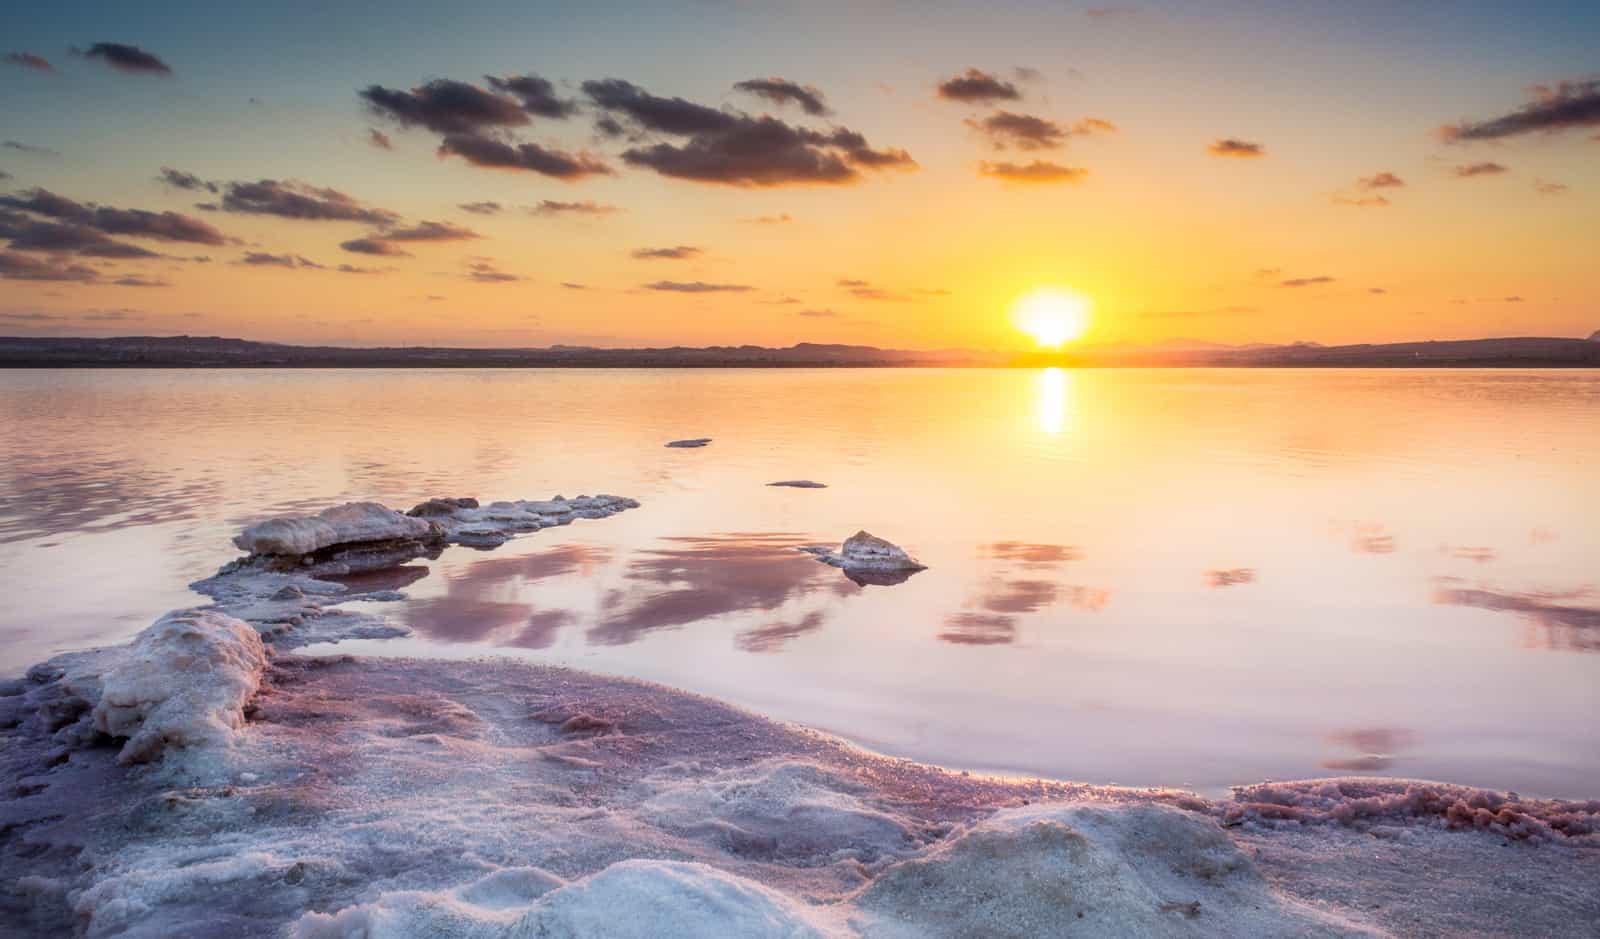 1500387219_Atardecer-sobre-playas-de-sal